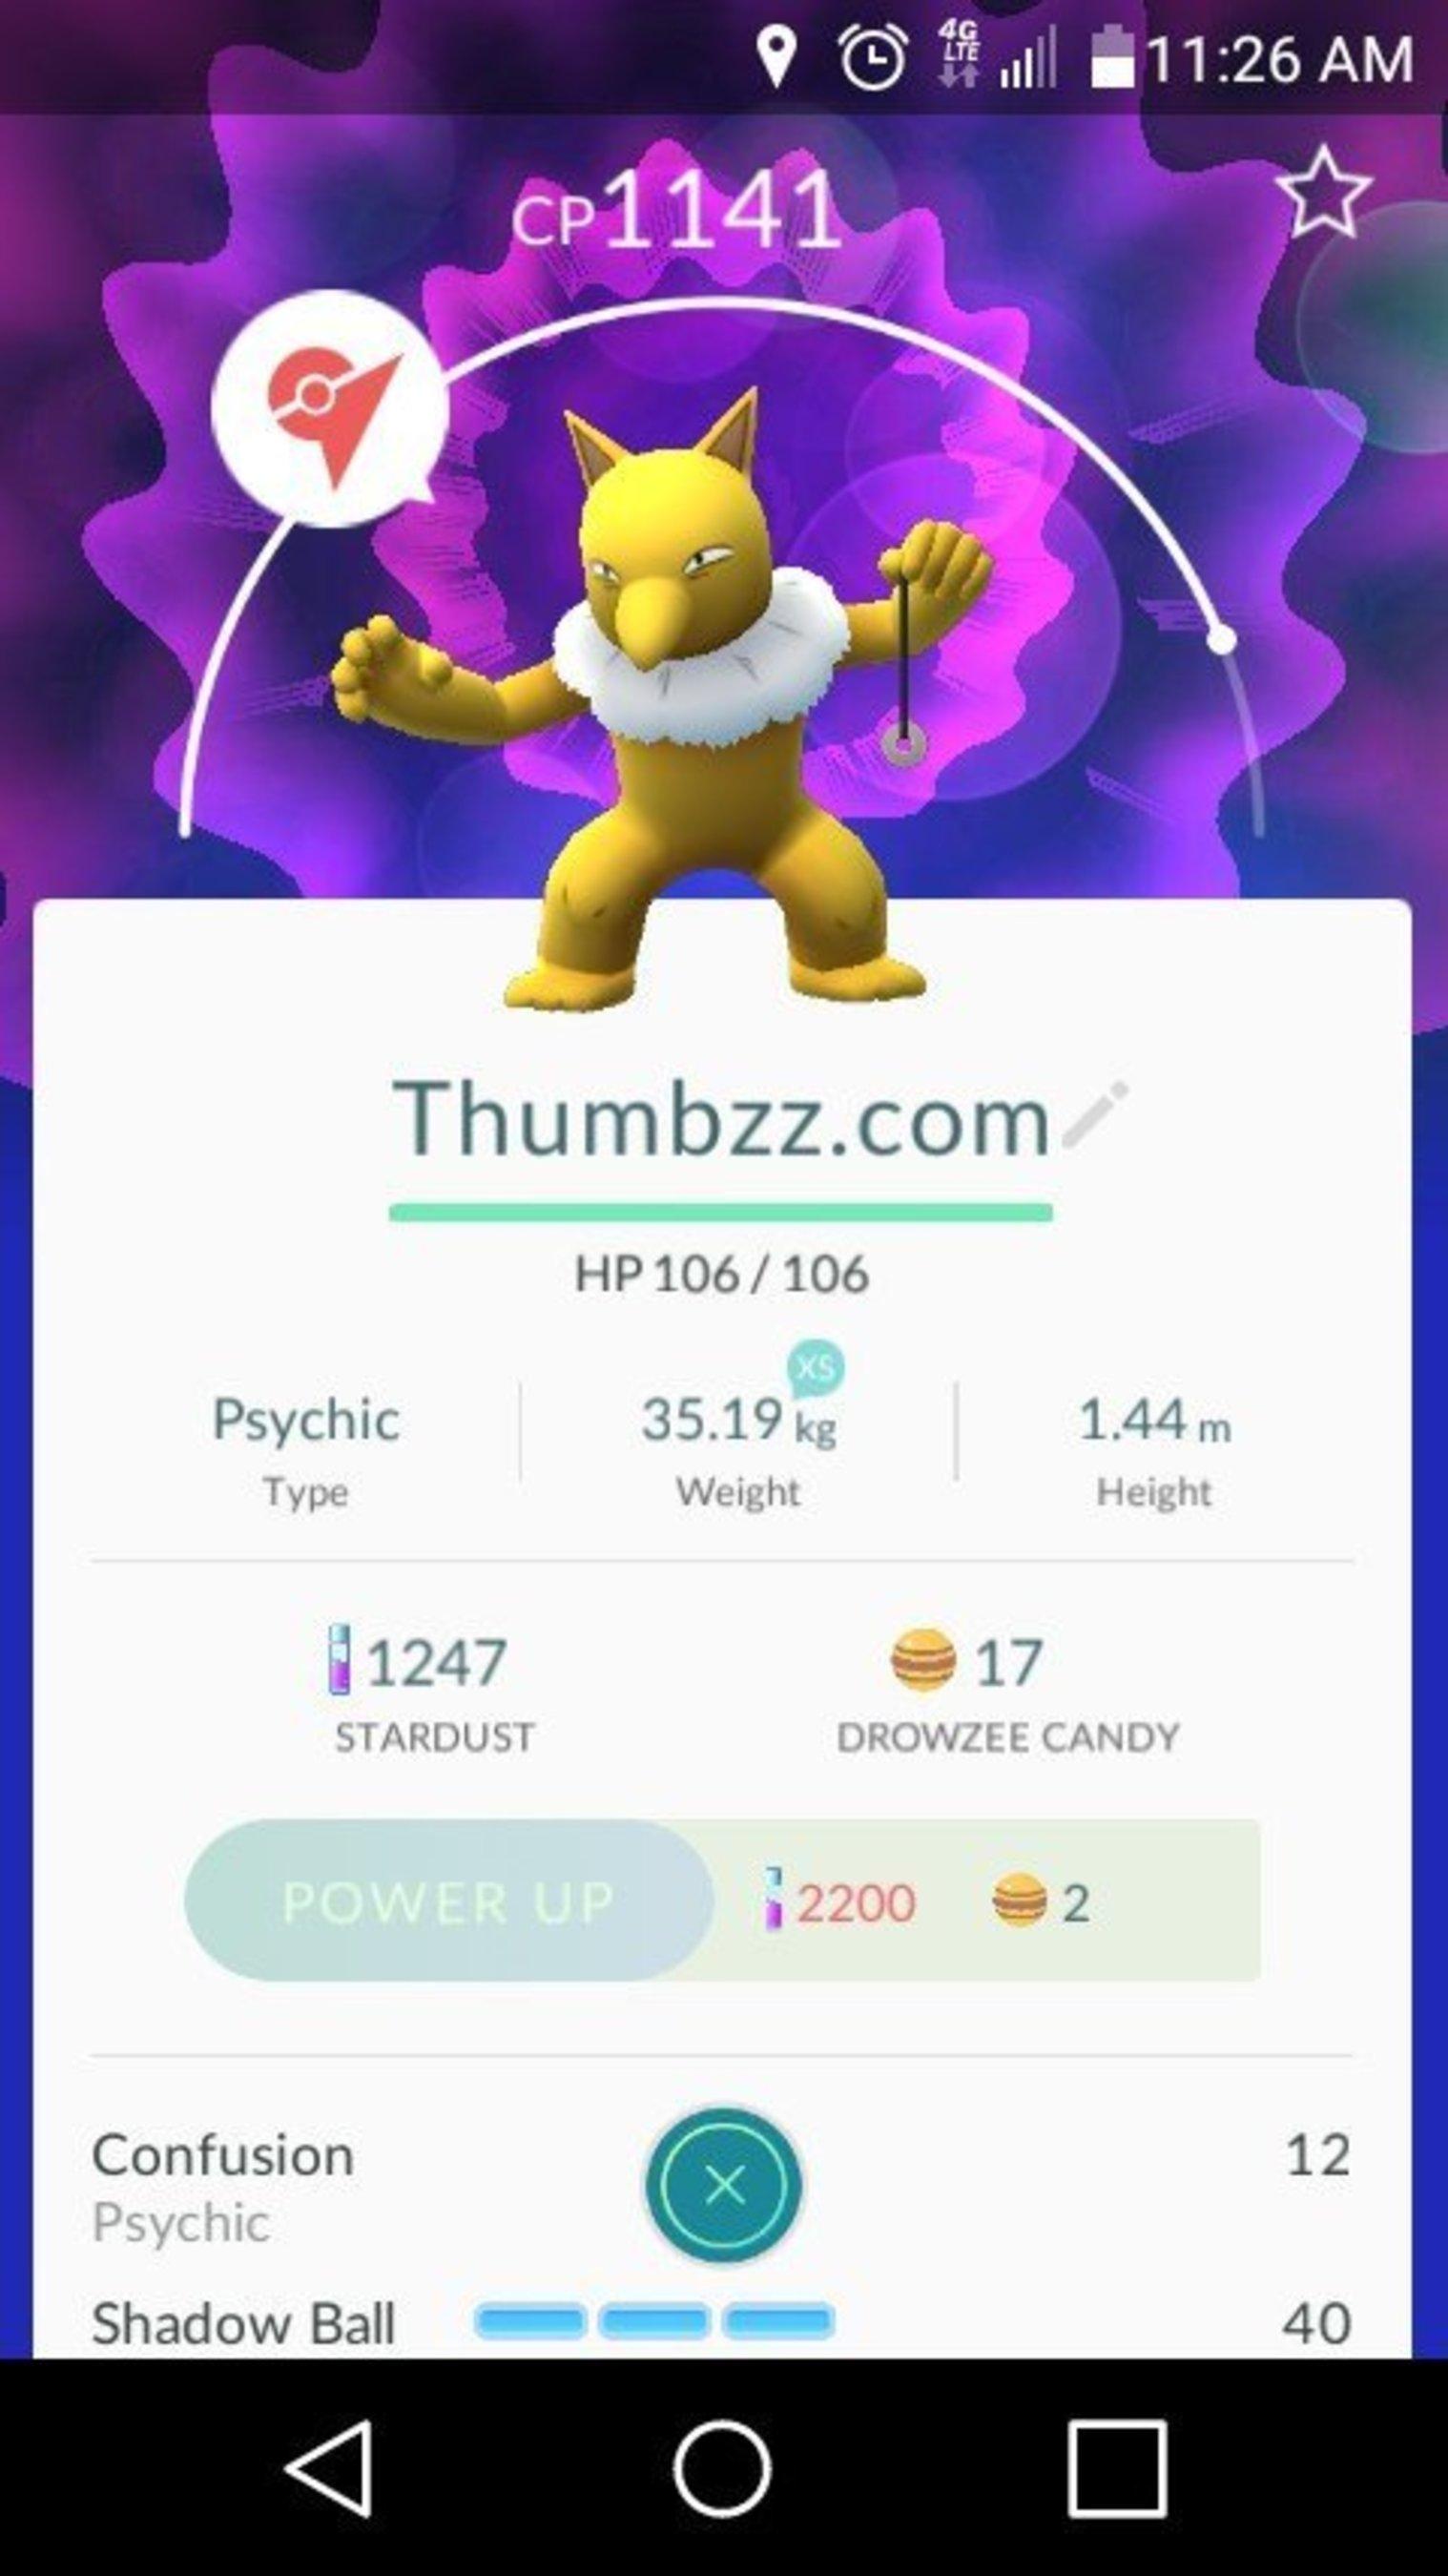 Startup Uses Pokemon Go App Craze To Lure Members